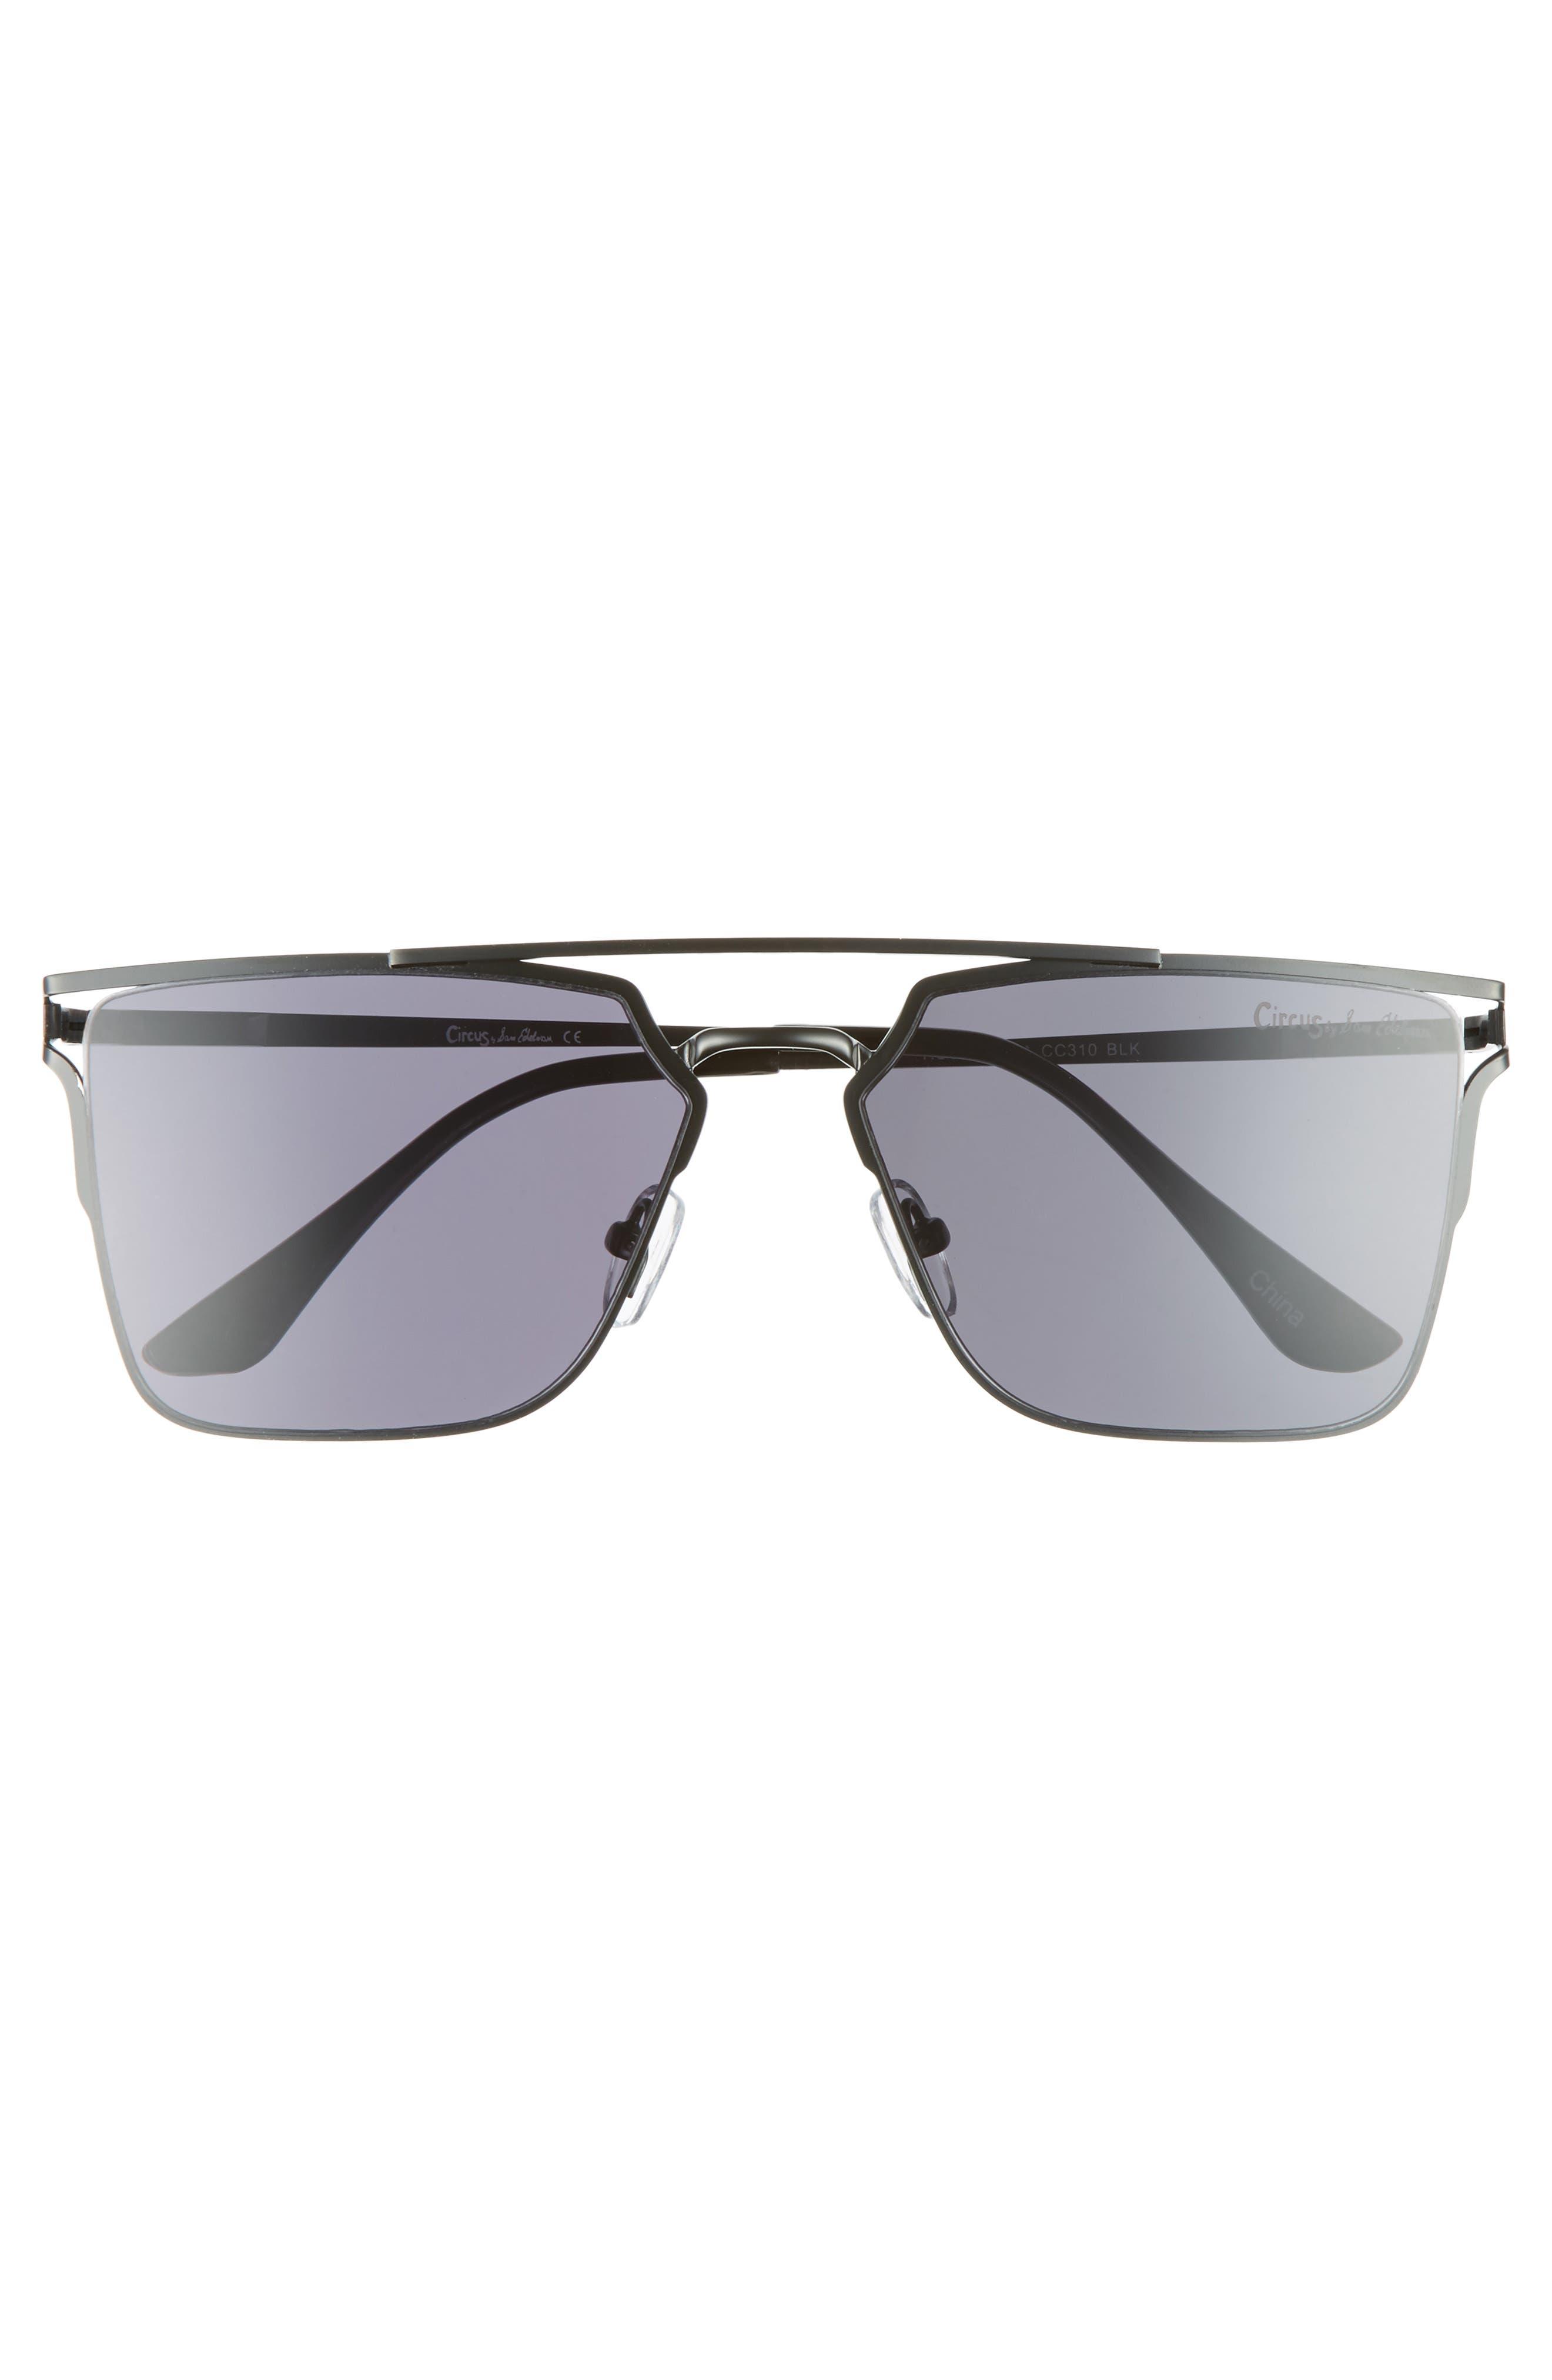 56mm Flat Top Sunglasses,                             Alternate thumbnail 3, color,                             001